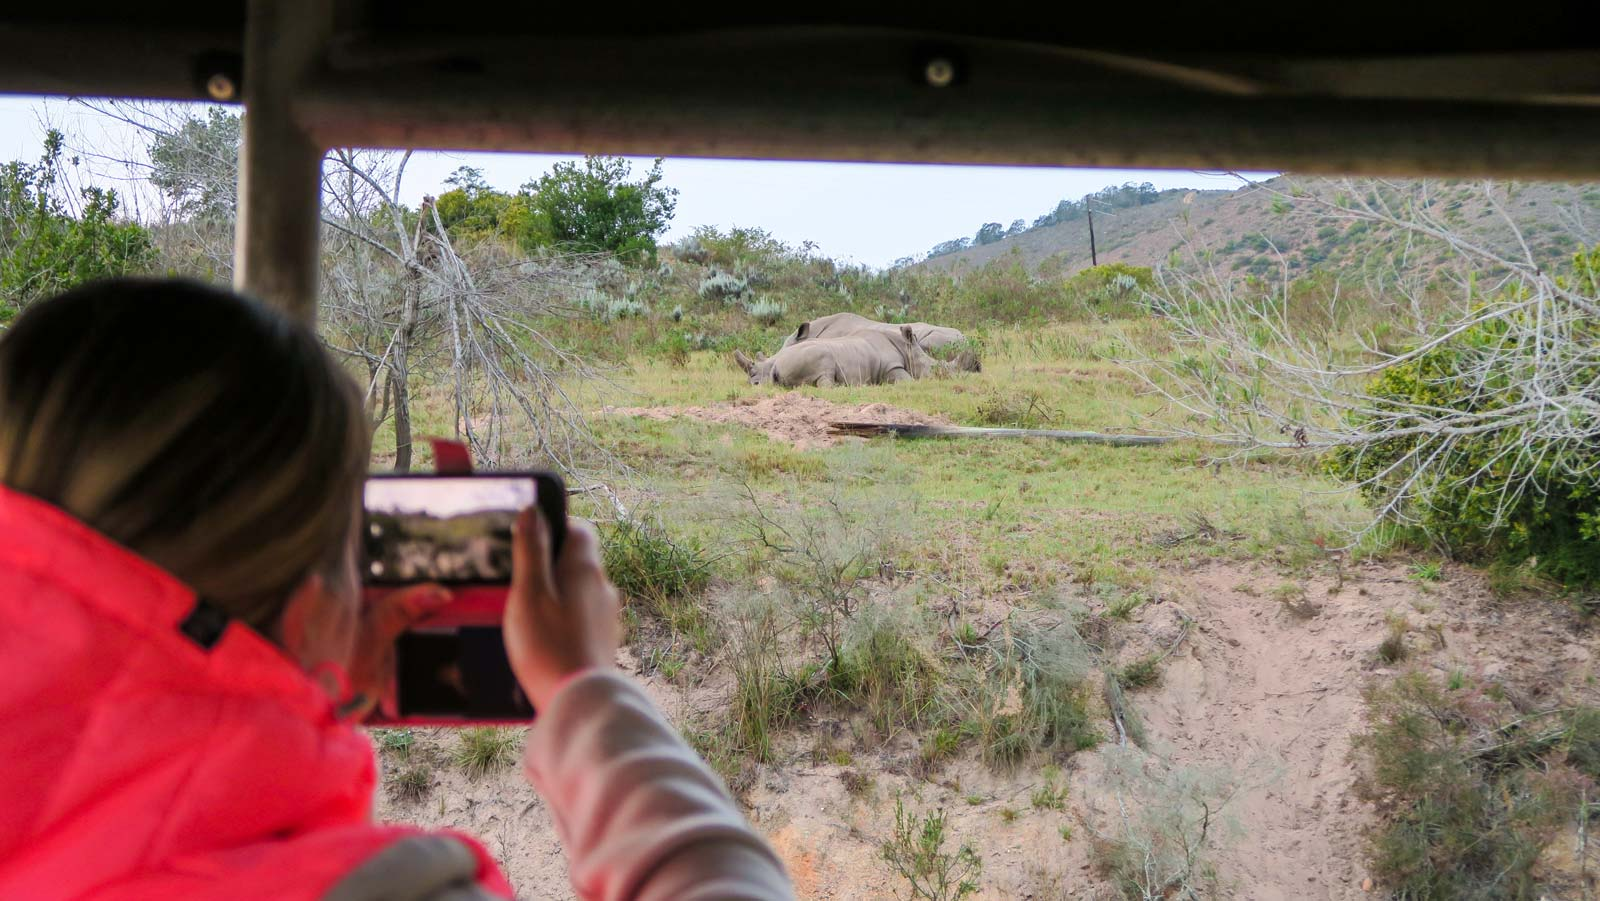 unterwegs auf Safari...